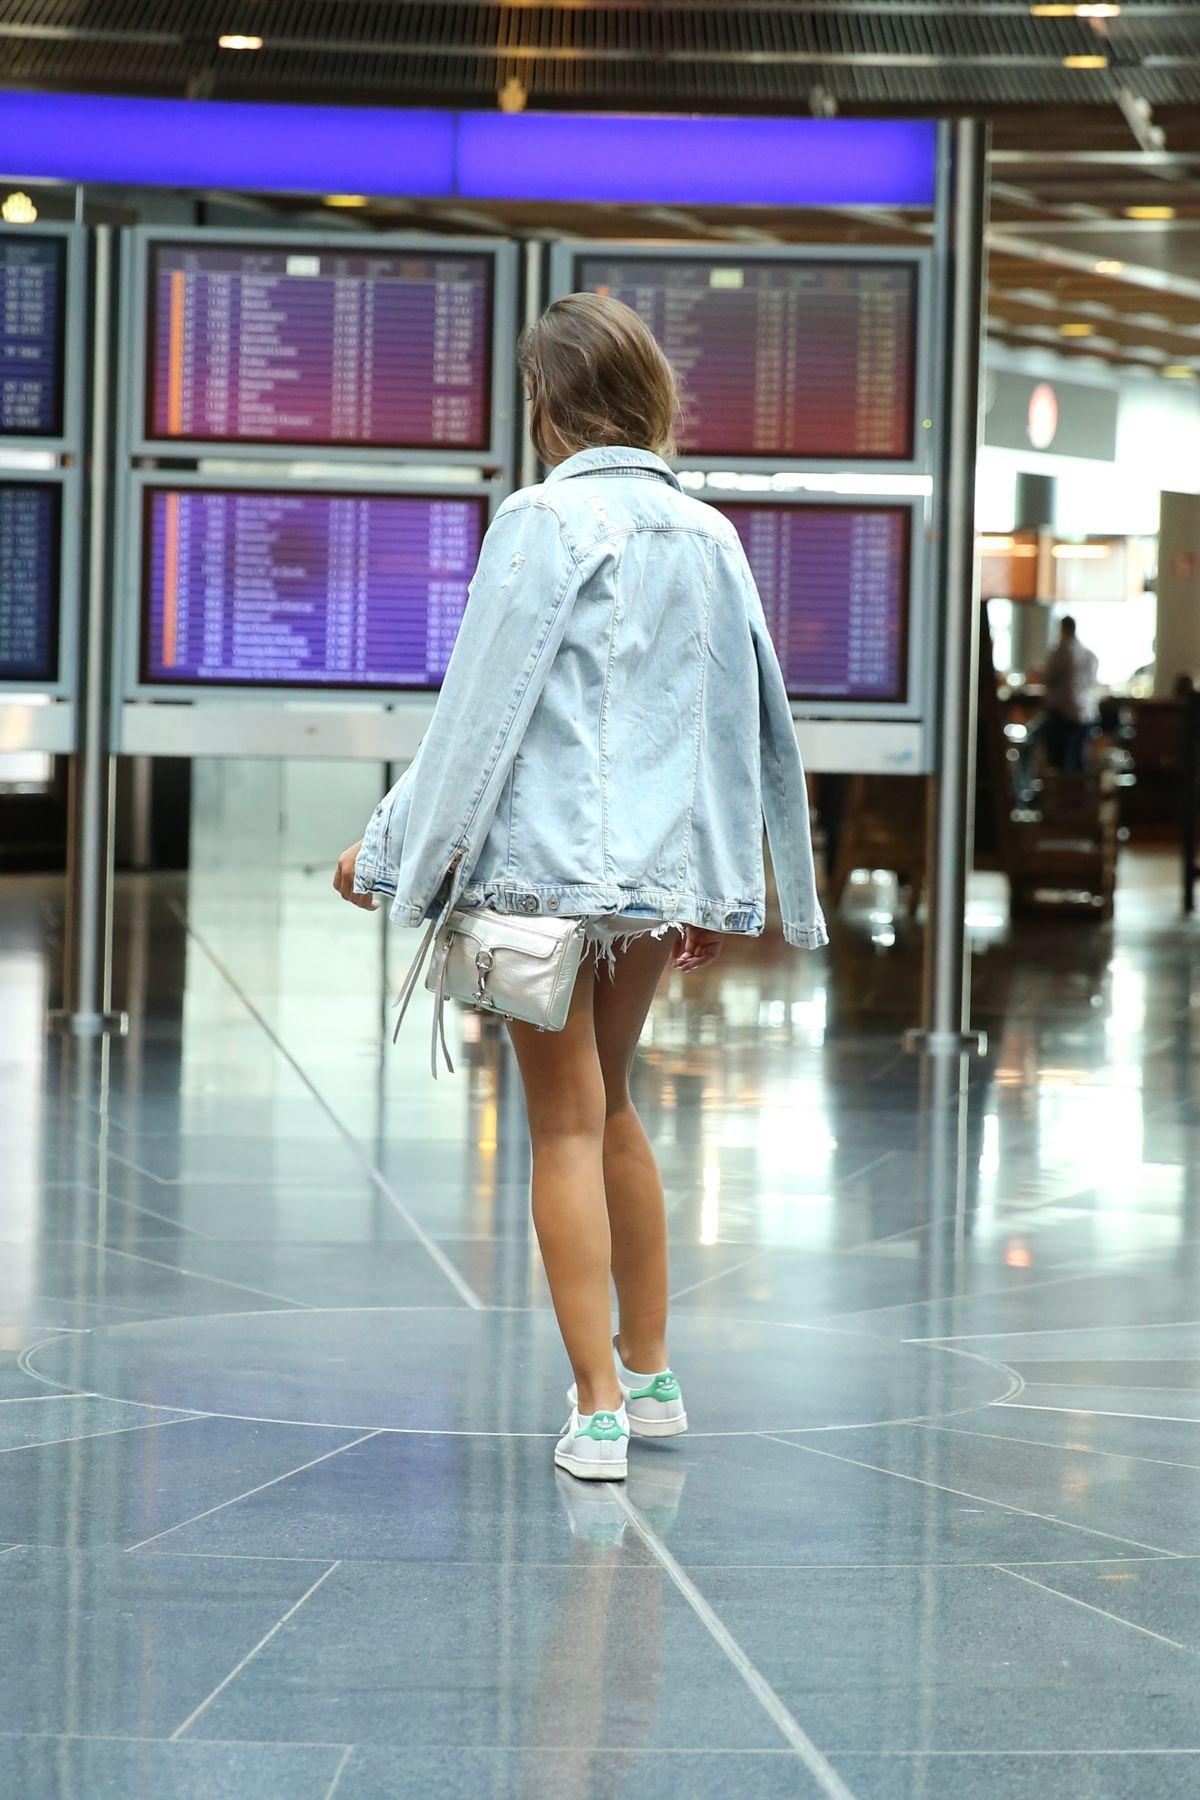 trendy_taste-look-outfit-street_style-ootd-blog-blogger-fashion_spain-moda_españa-traveling-viaje-frankfurt-stan_smith-adidas-lentejuelas-top-denim-shorts-vaqueros_rotos-2